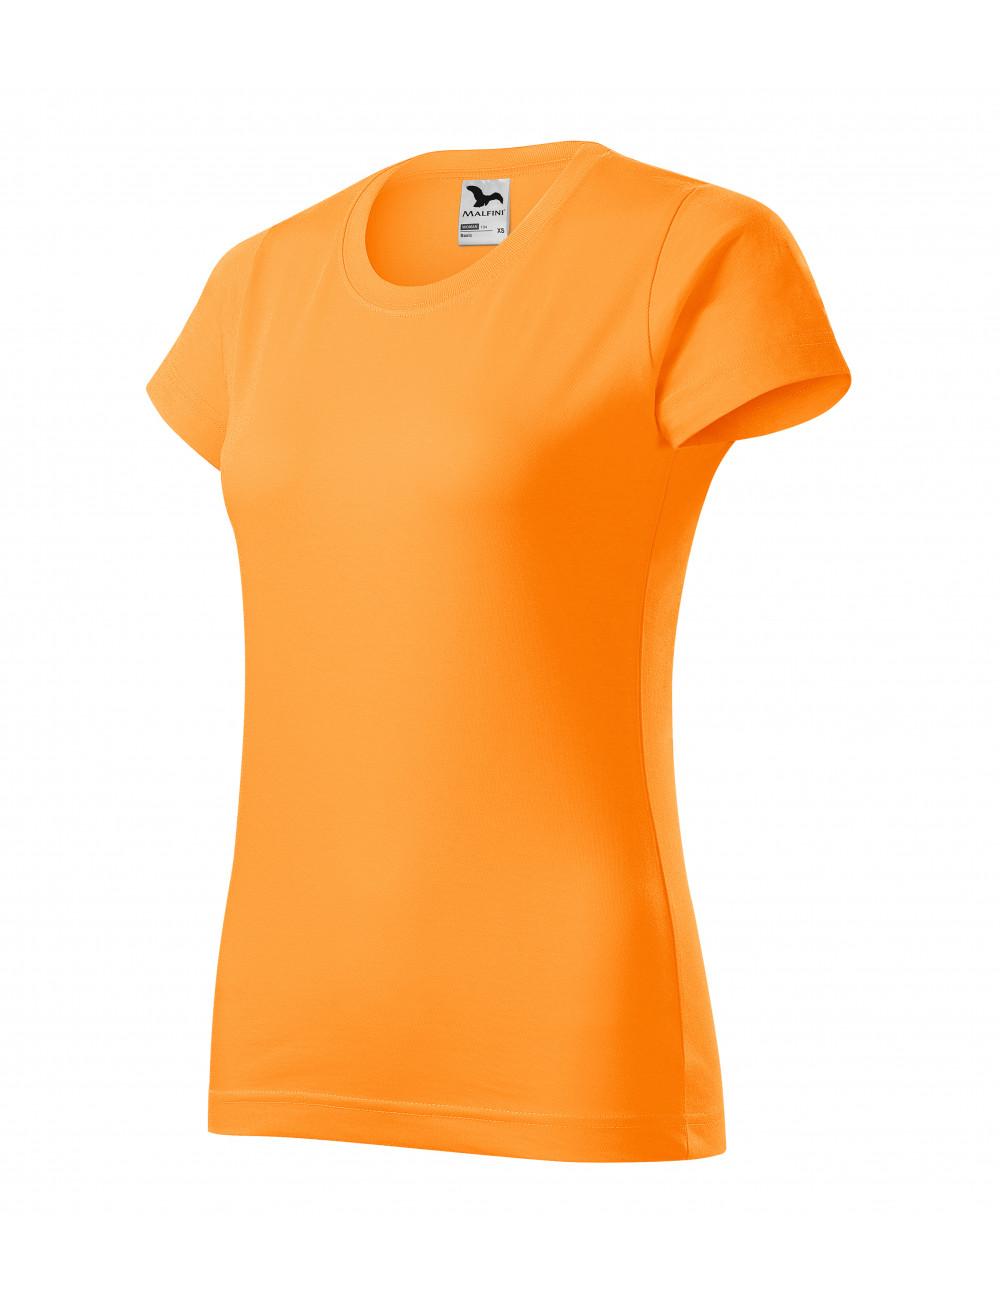 Adler MALFINI Koszulka damska Basic 134 mandarynkowy